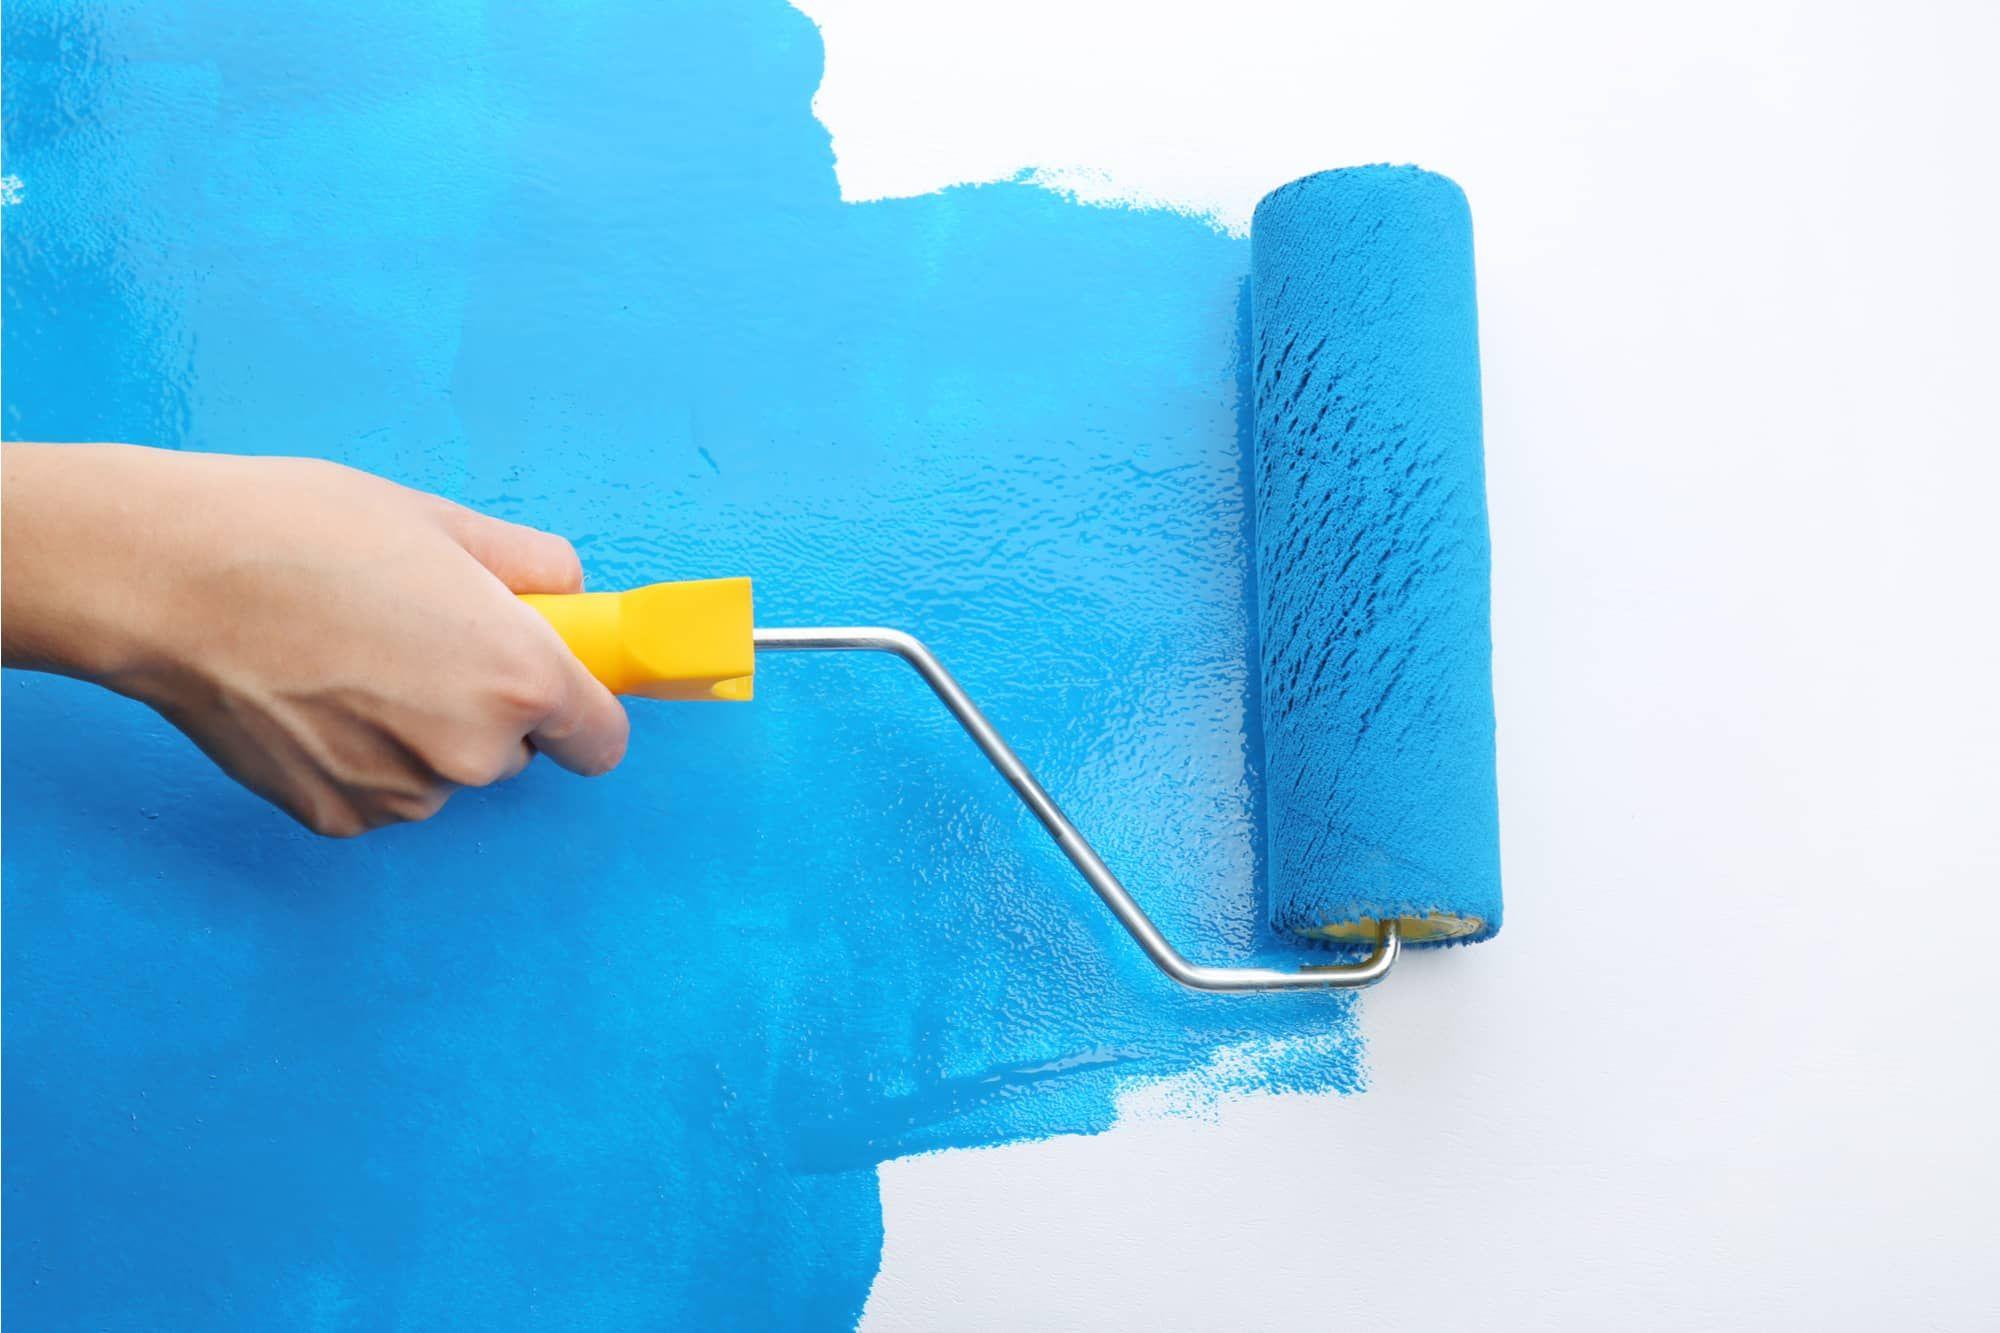 10 best non voc low toxic interior paints interior on top 10 interior paint brands id=95518